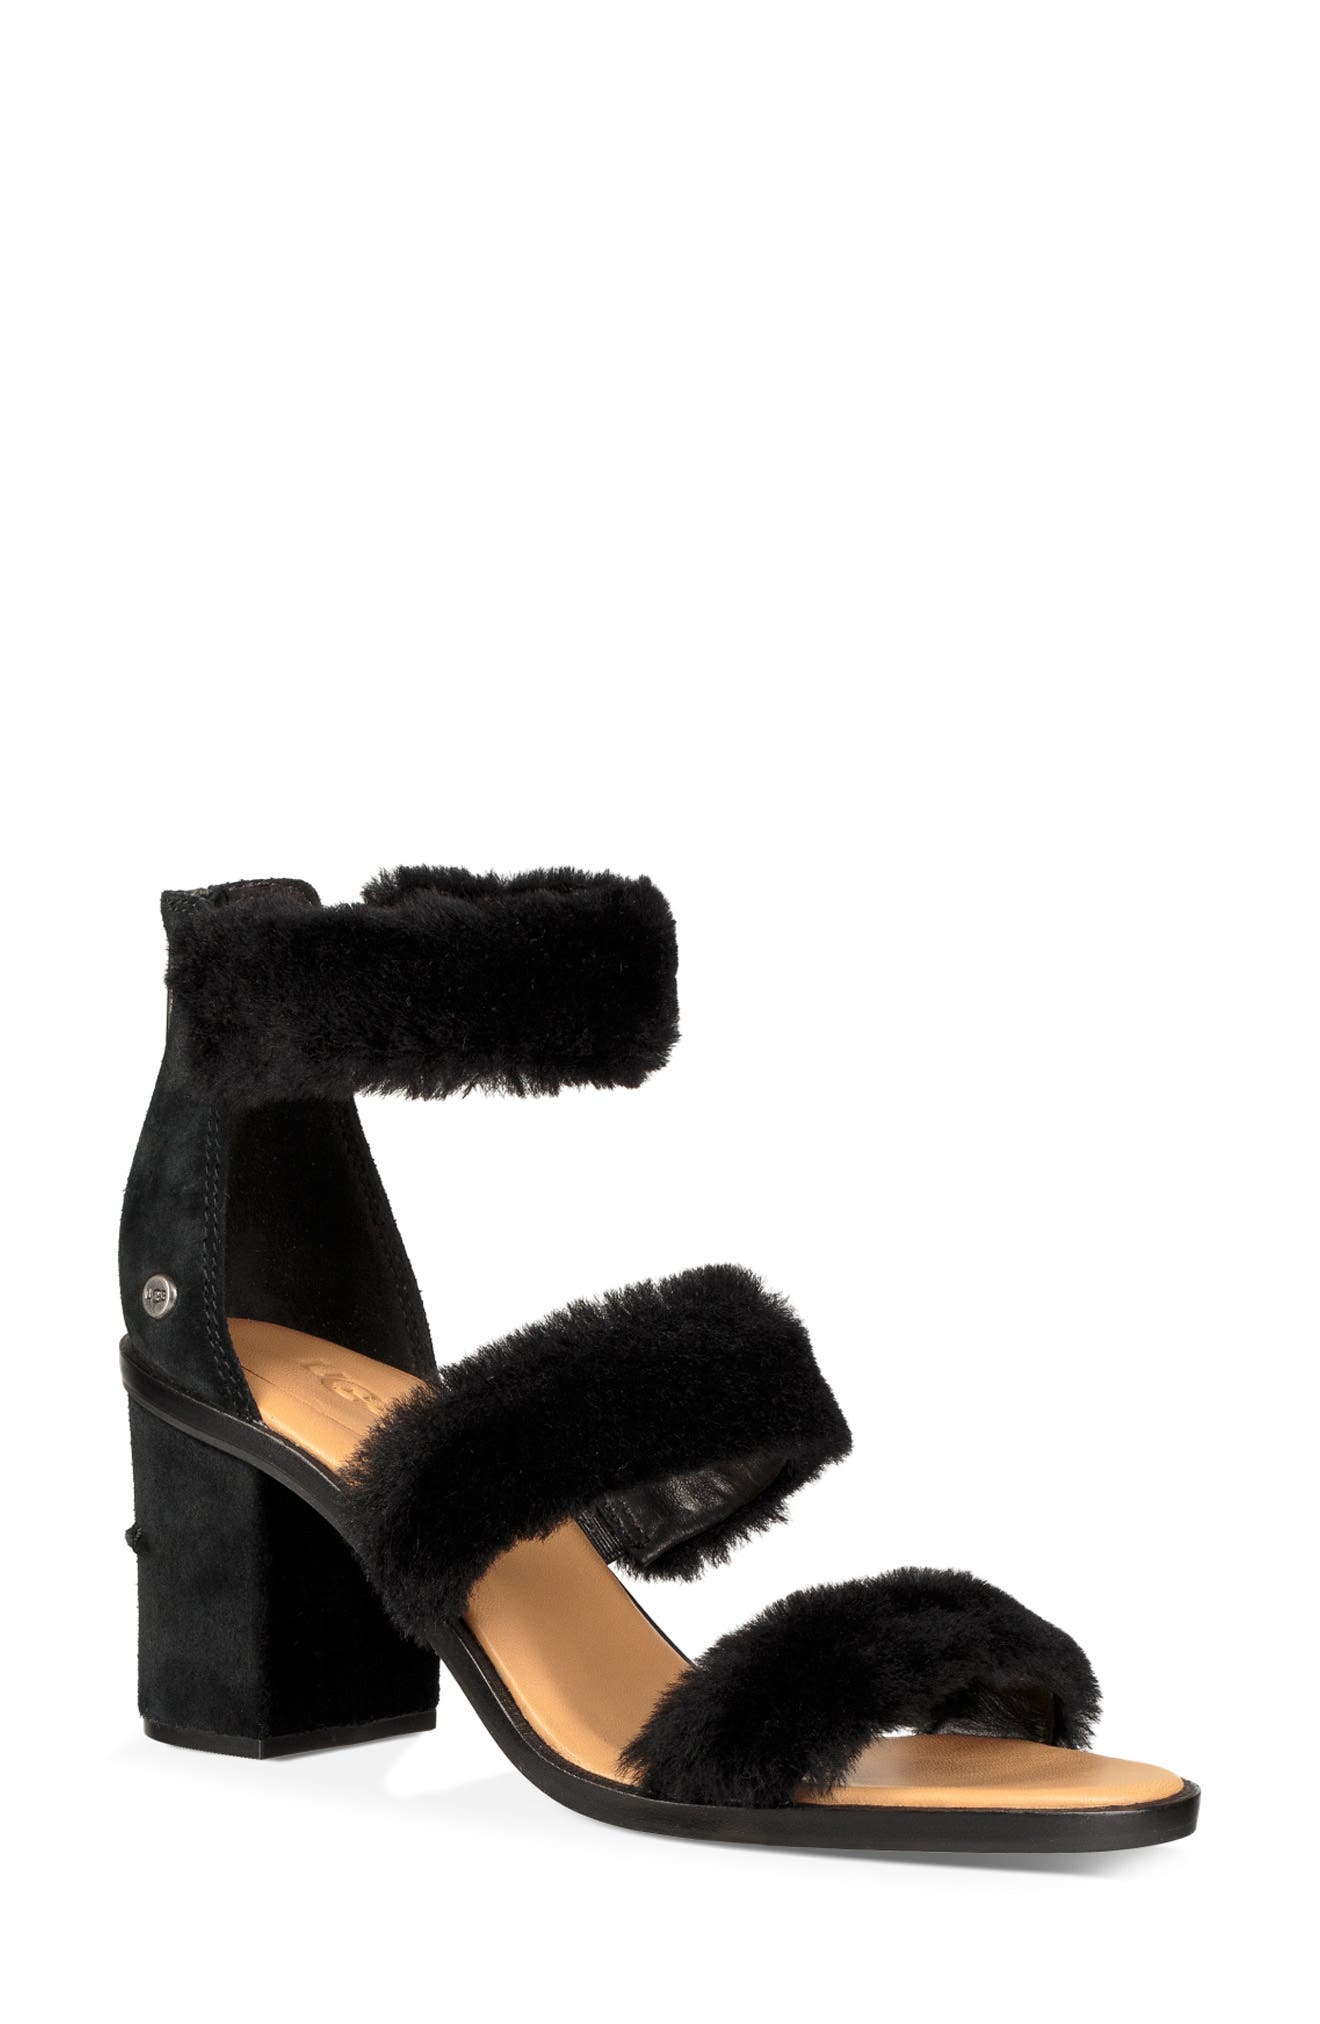 Dey Rey Genuine Shearling Sandal,                         Main,                         color, 001